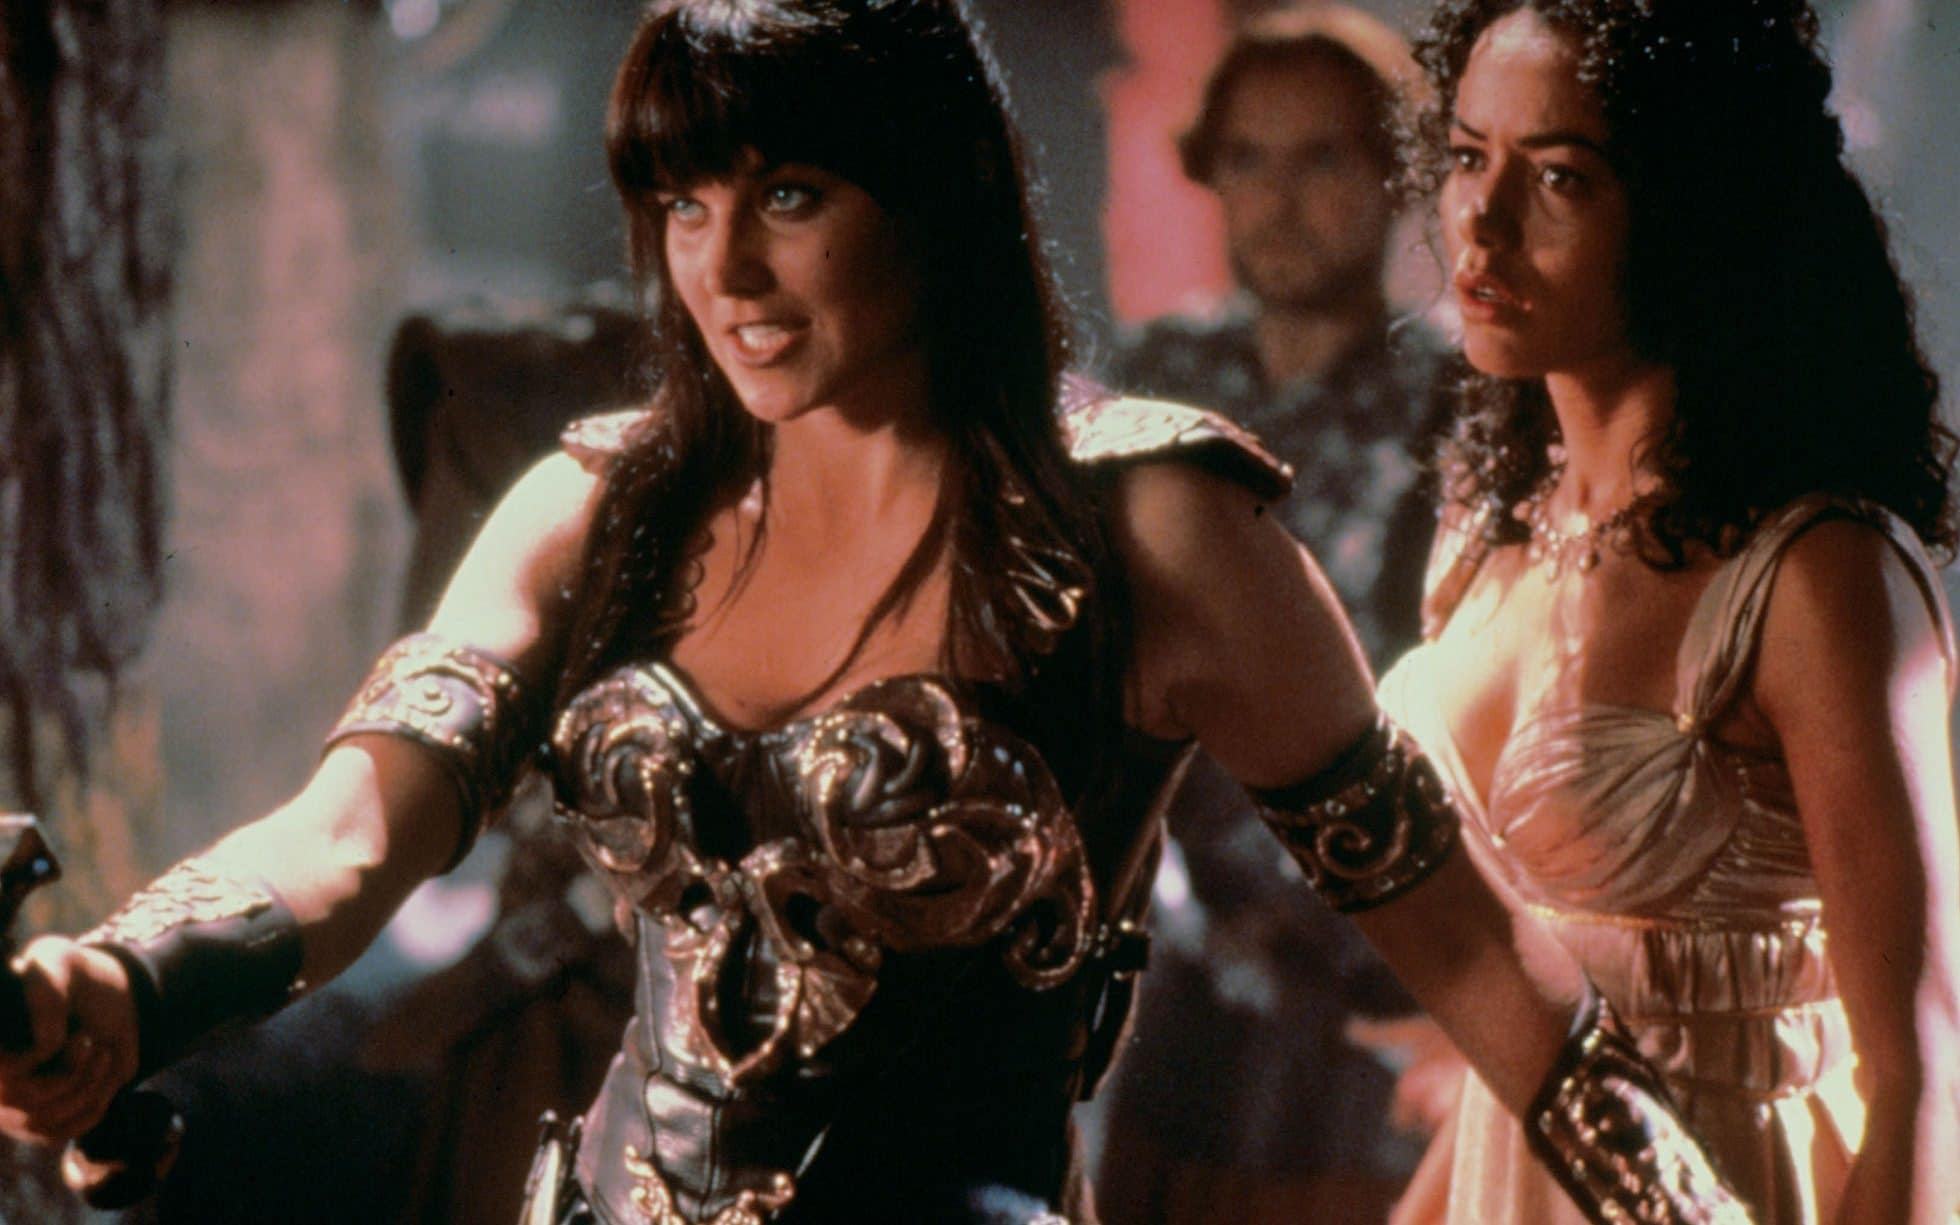 Arab Princess Porn xena princess warrior porn - megapornx